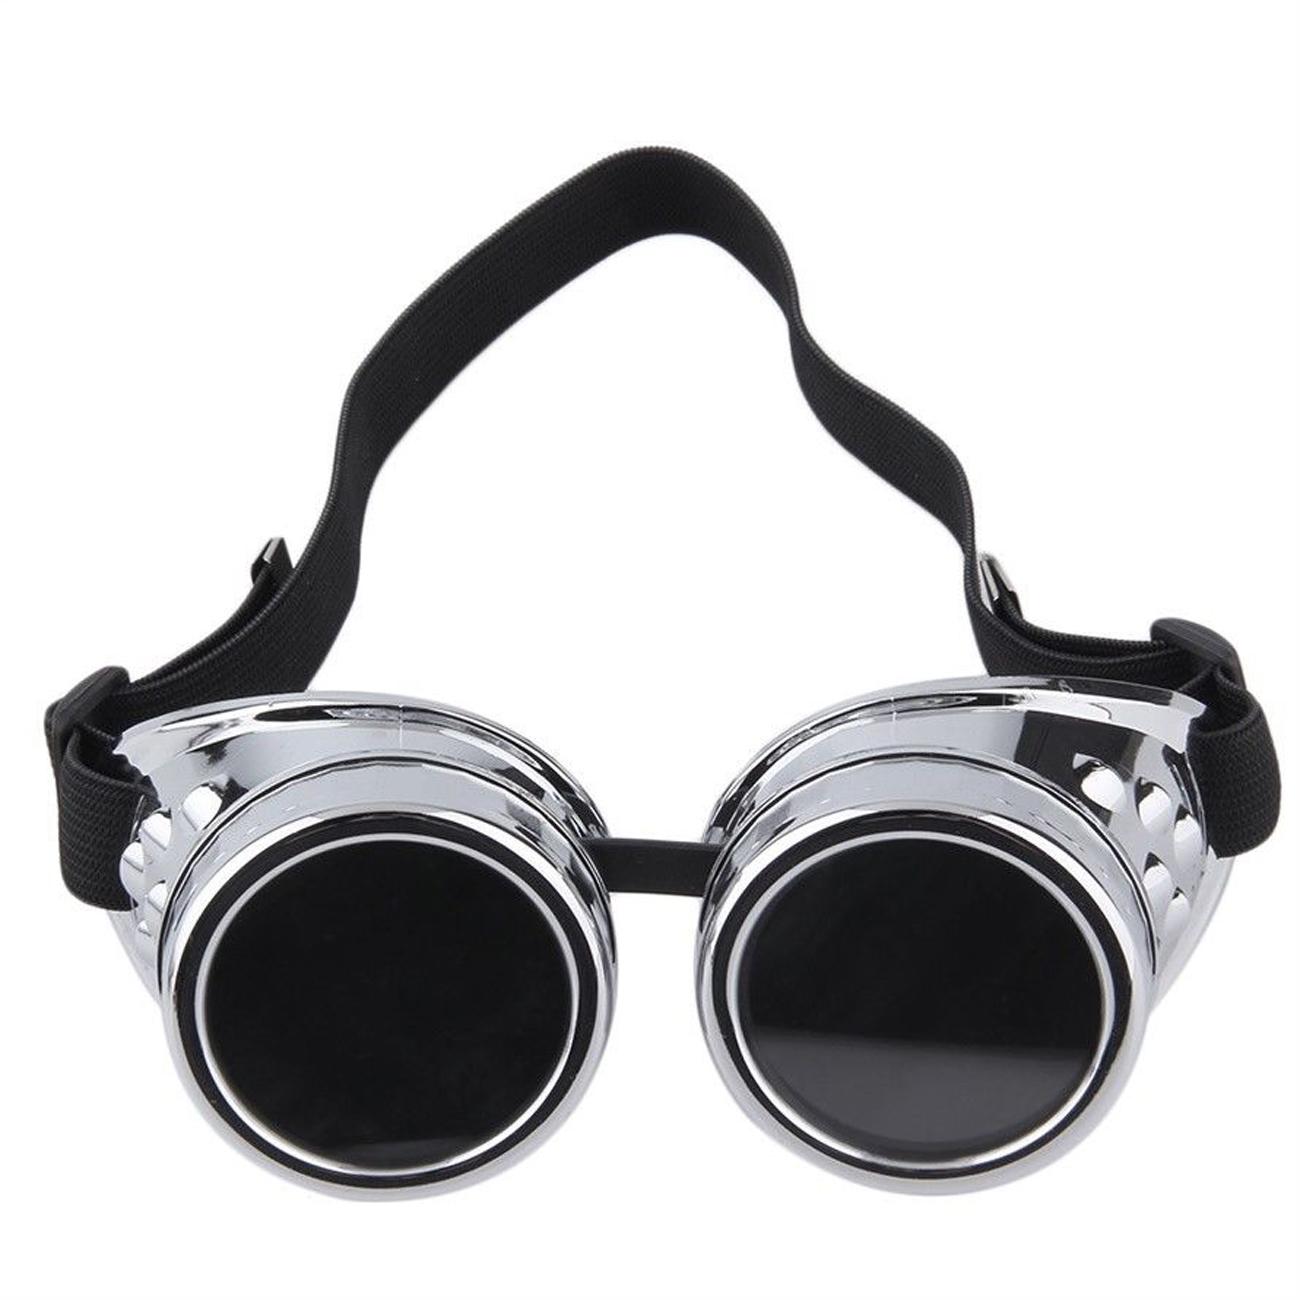 <font color='#FF0000'>C.F.GOGGLE Motorcycle Glasses Goggles Aviator Biker Vintage Outdoor</font>